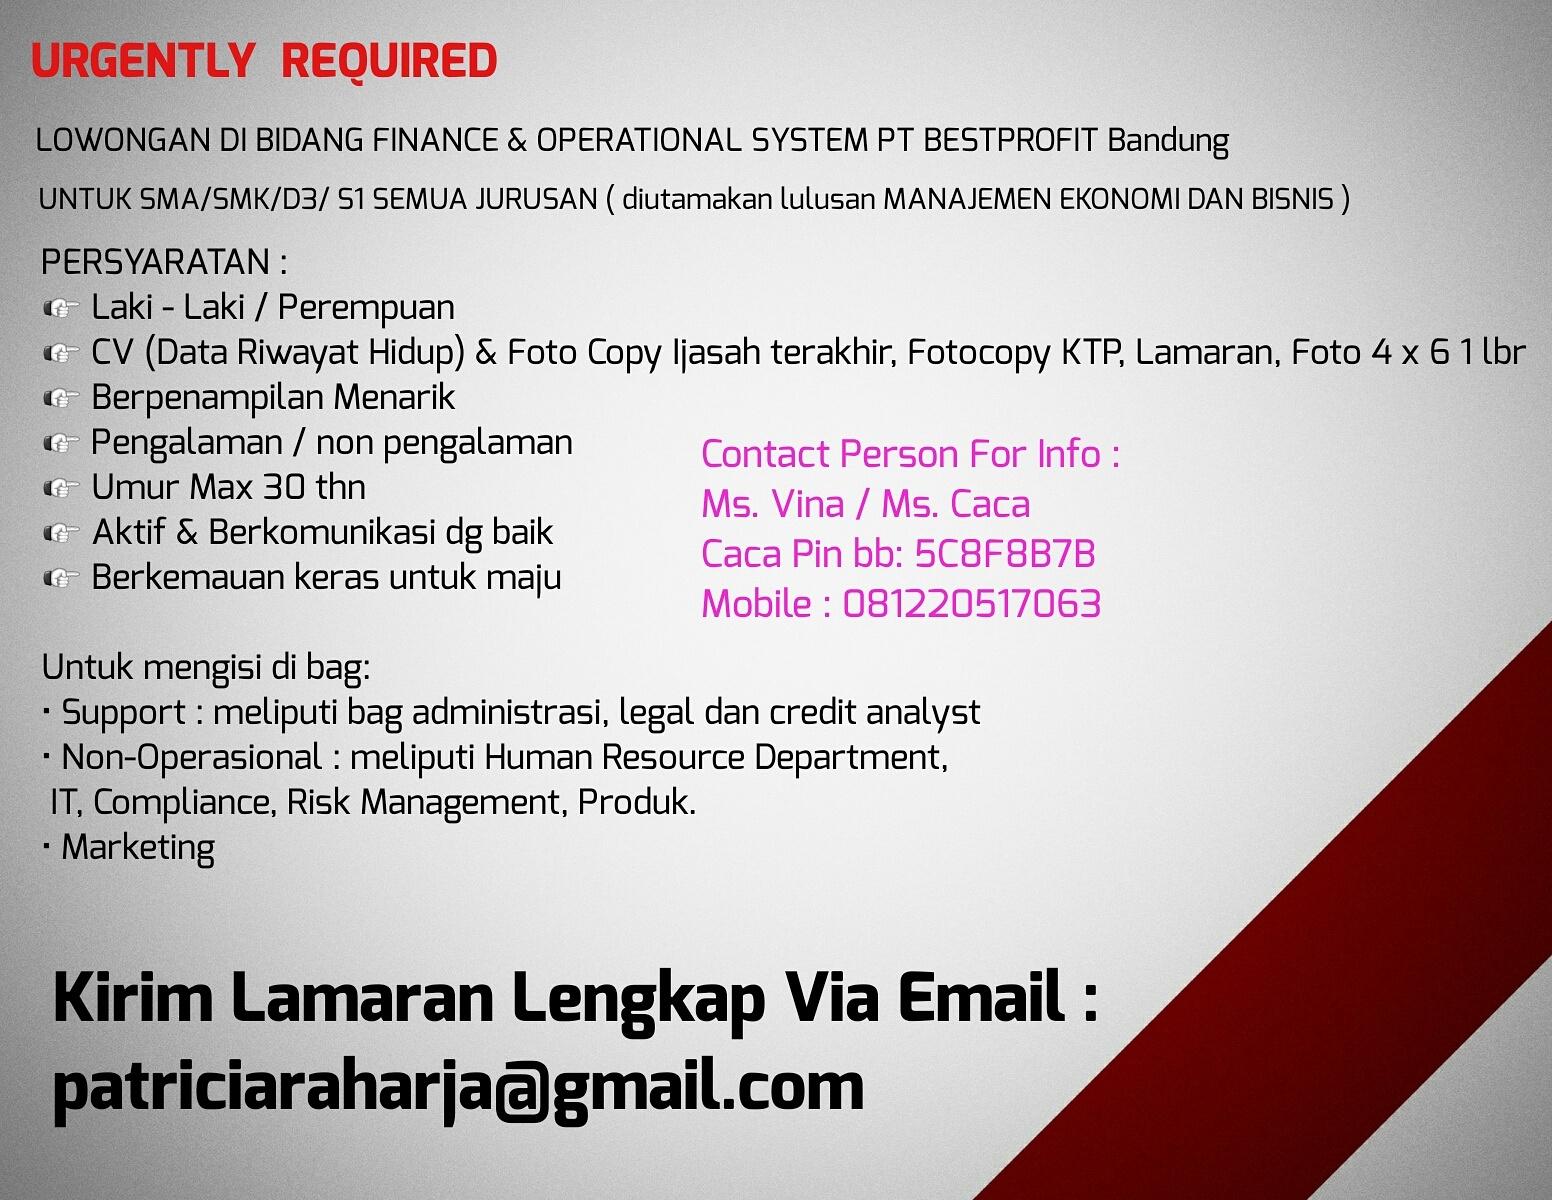 Lowongan Kerja Finance & Operational System PT. Best Profit Bandung Desember 2016